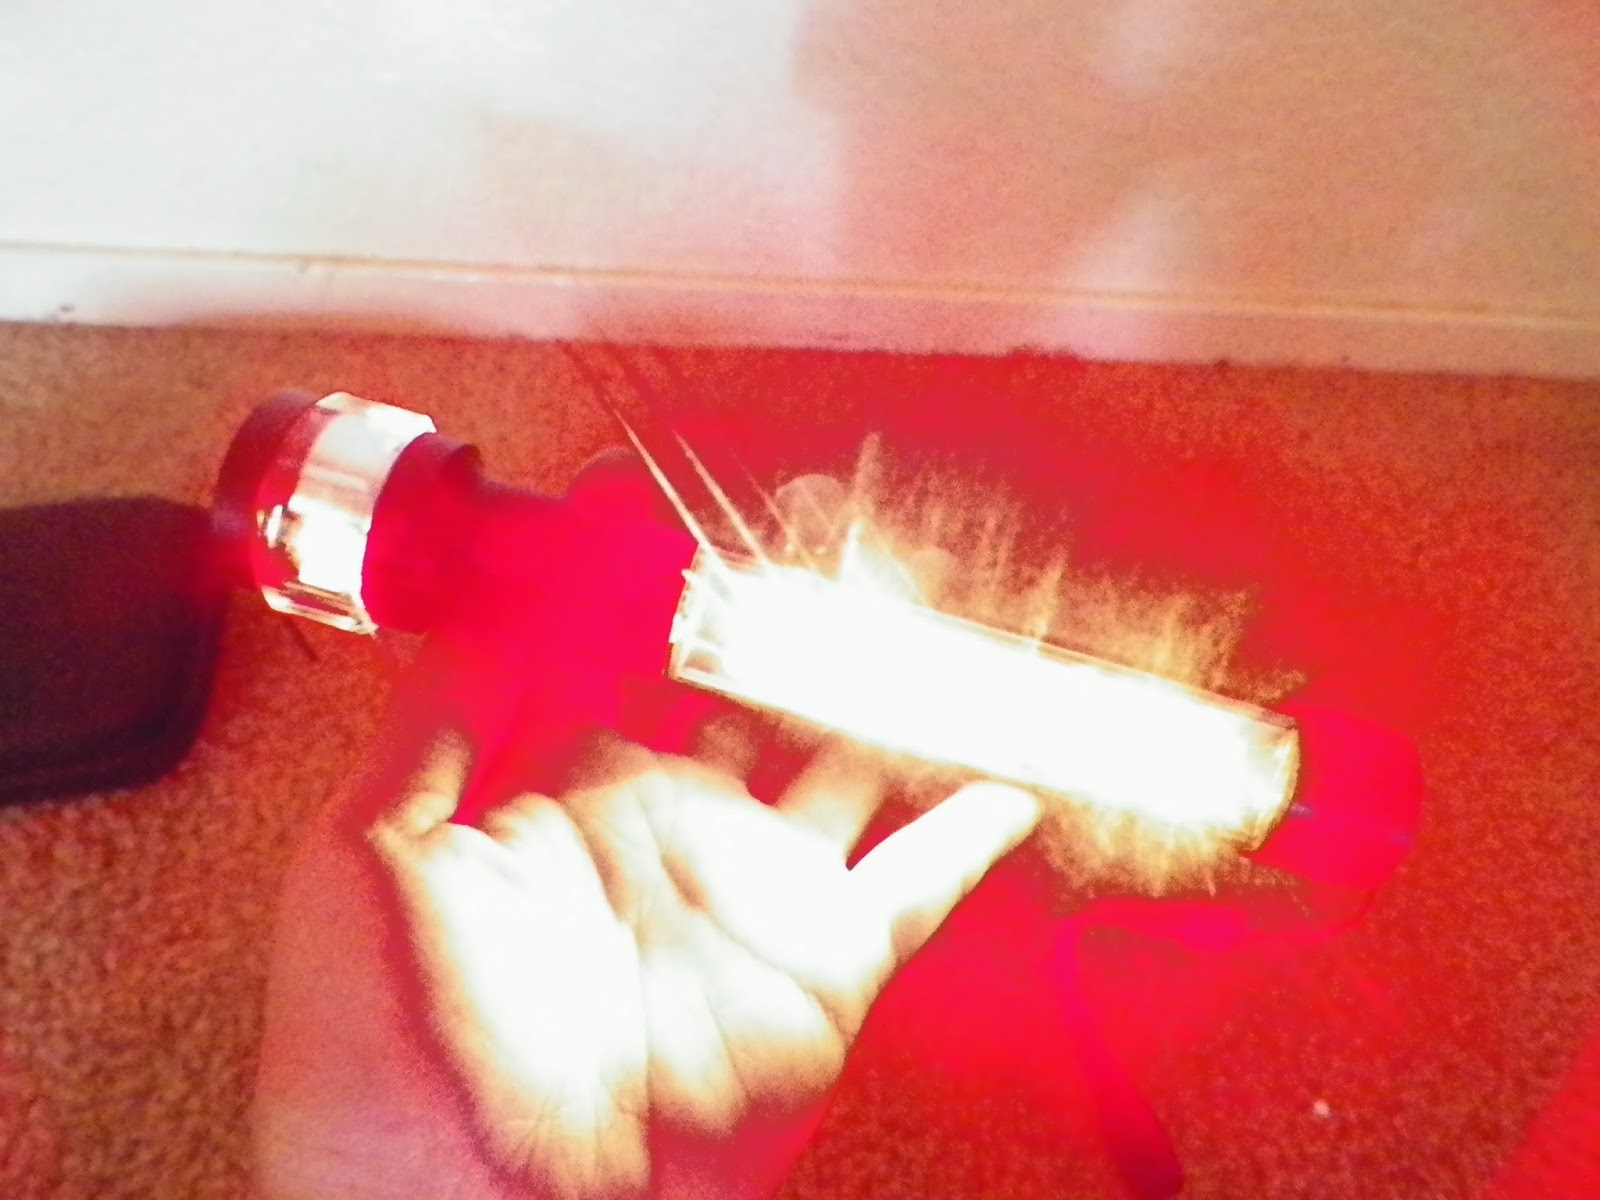 AYL_3_in_1_flashlight.jpg